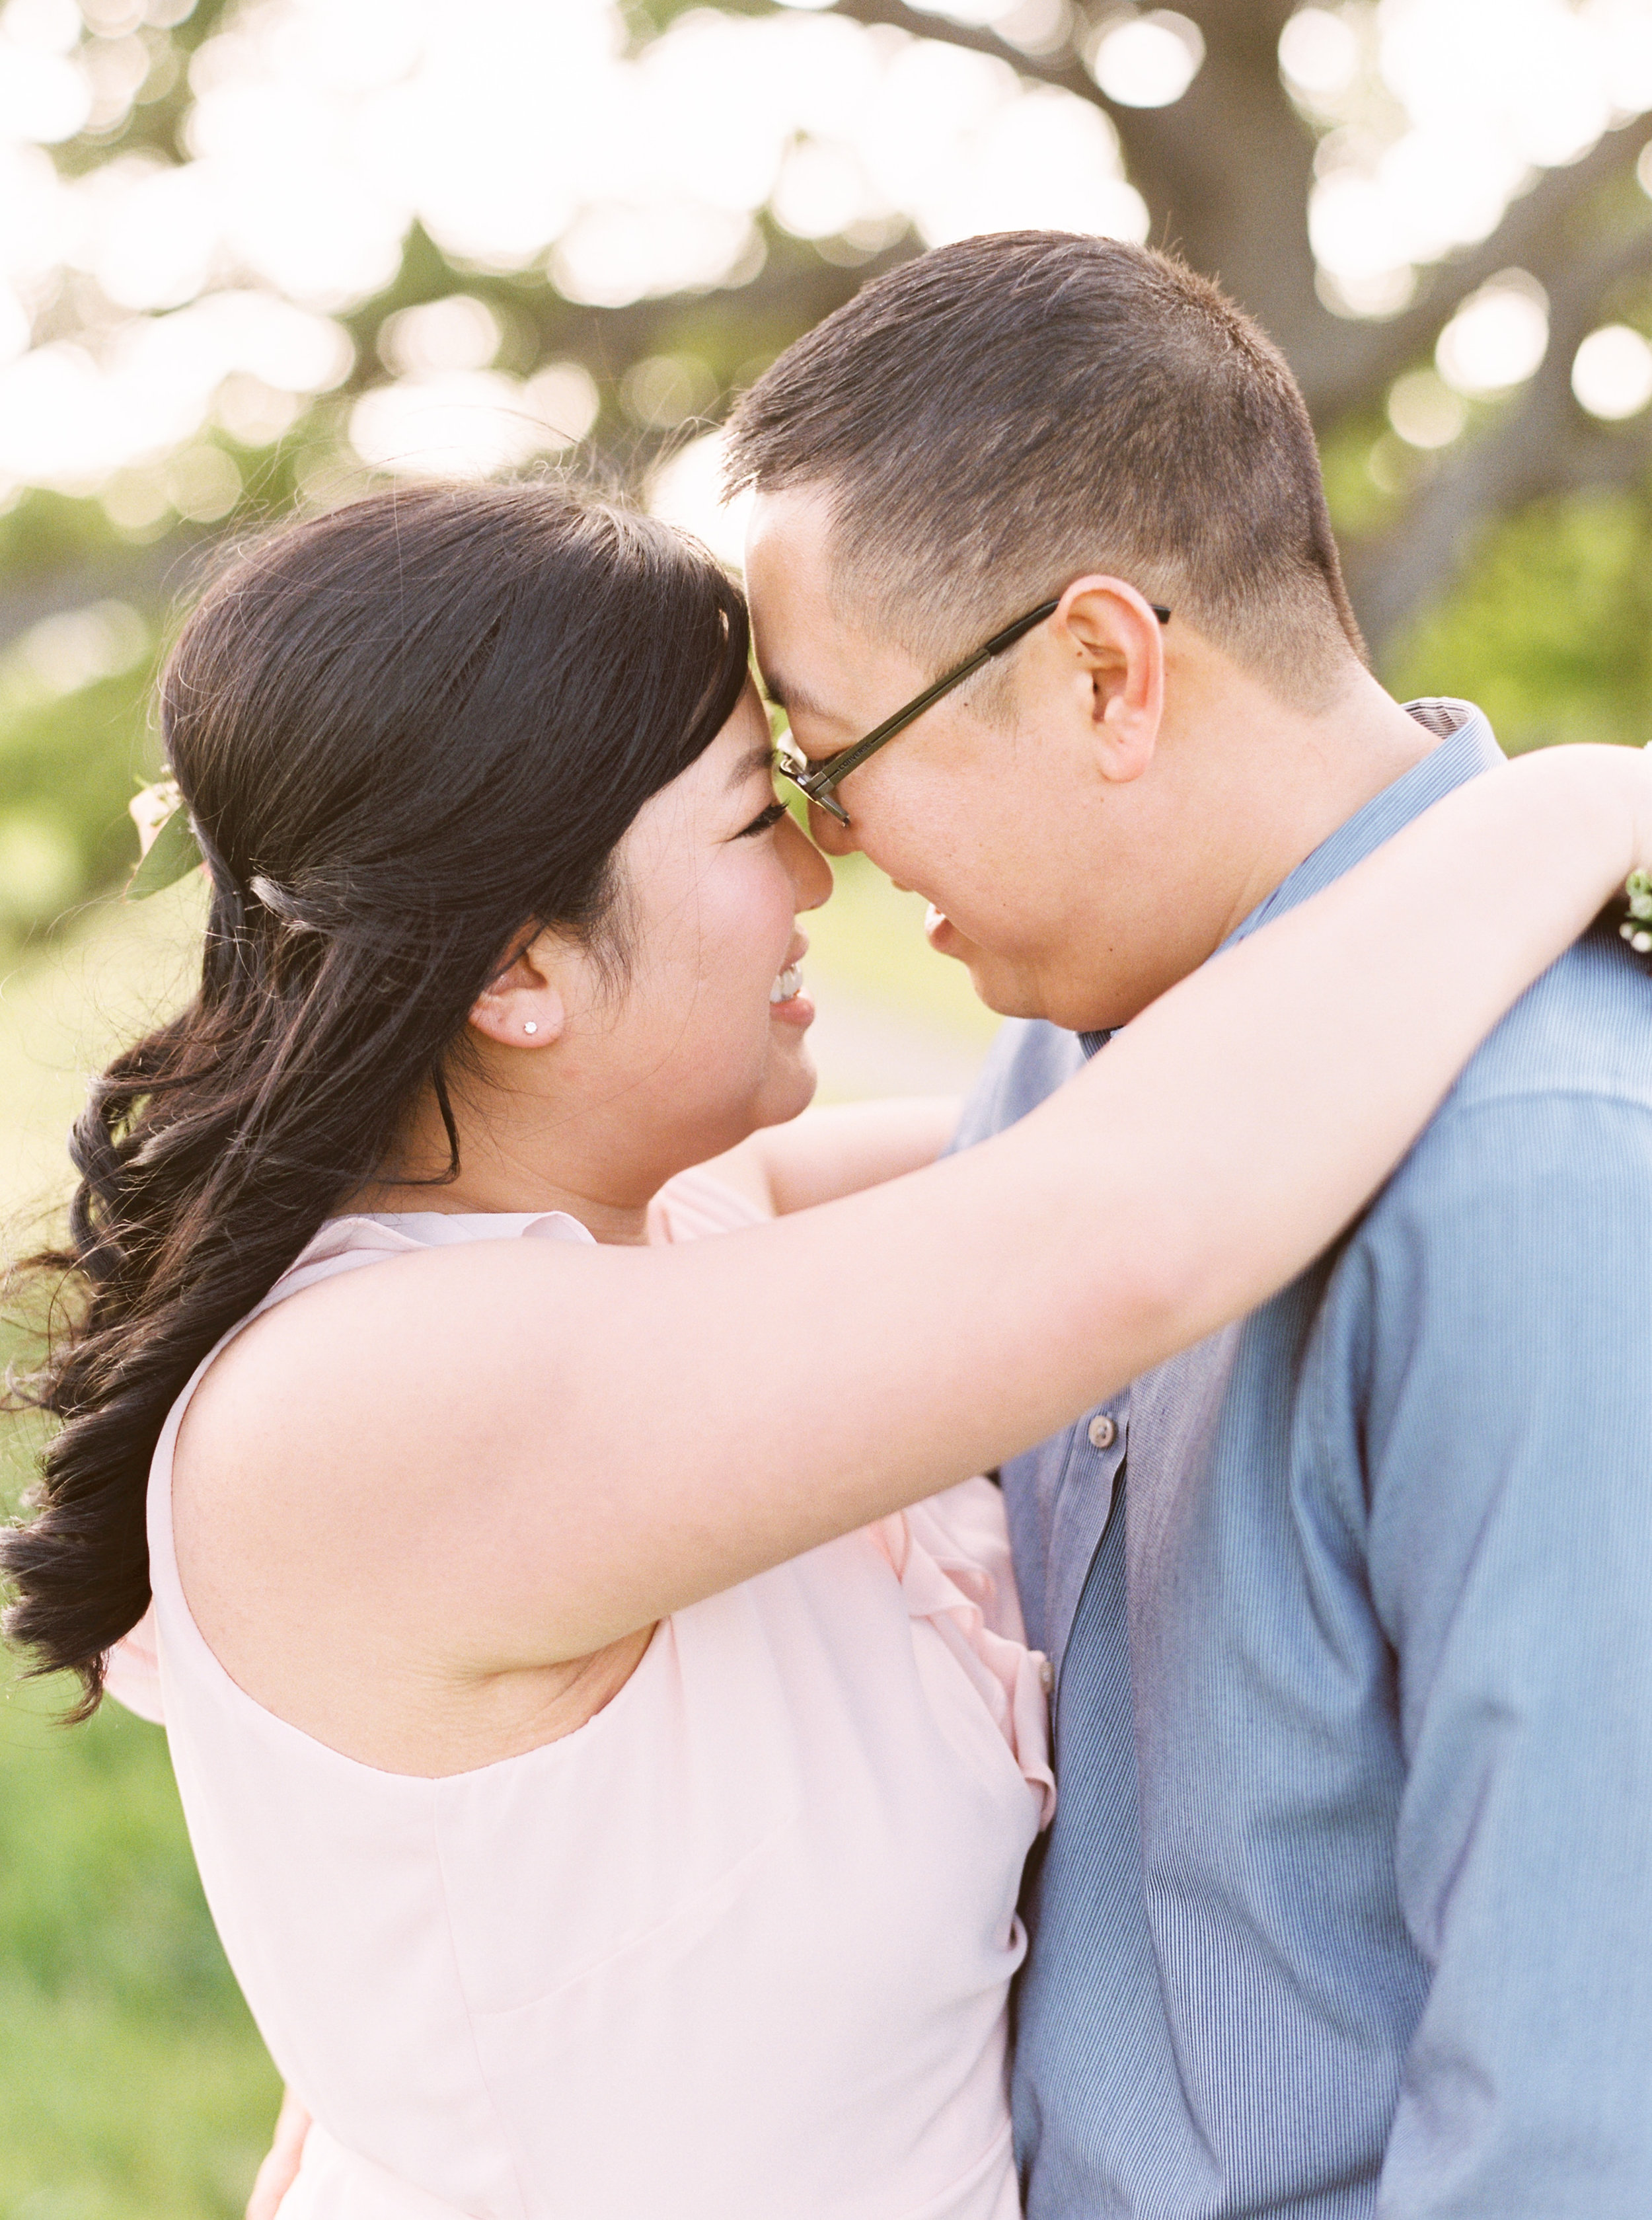 del-valle-livermore-bay-area-wedding-photographer-56.jpg